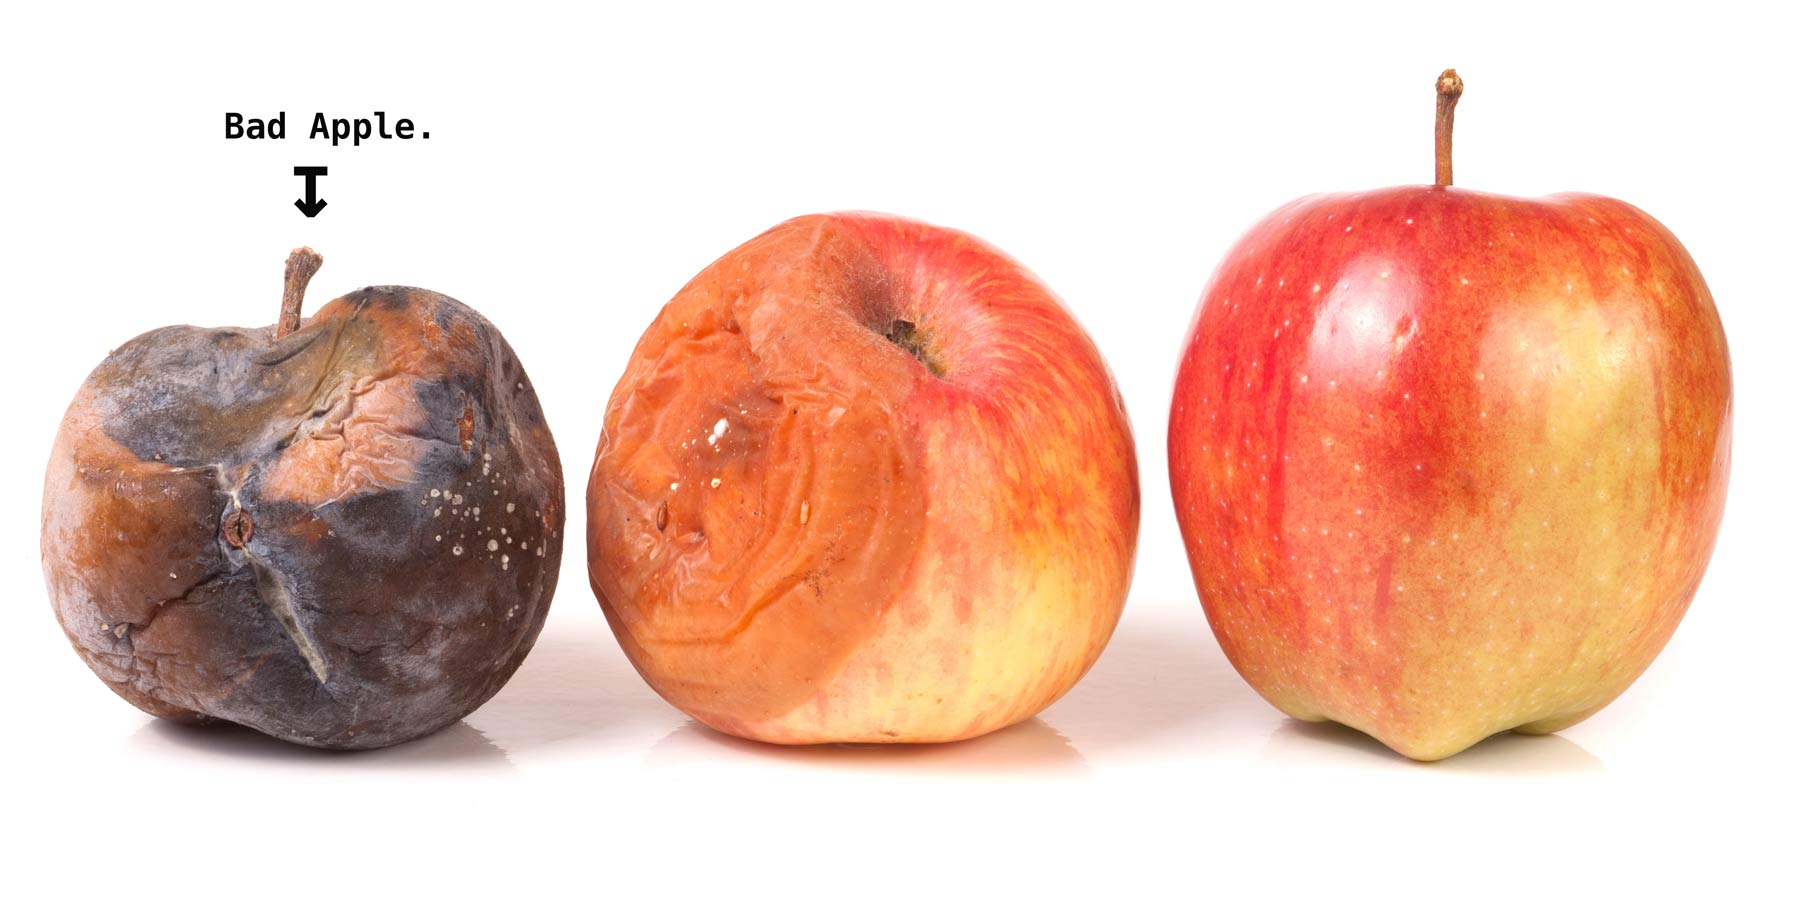 bad_apple_bad_buysell_agreement